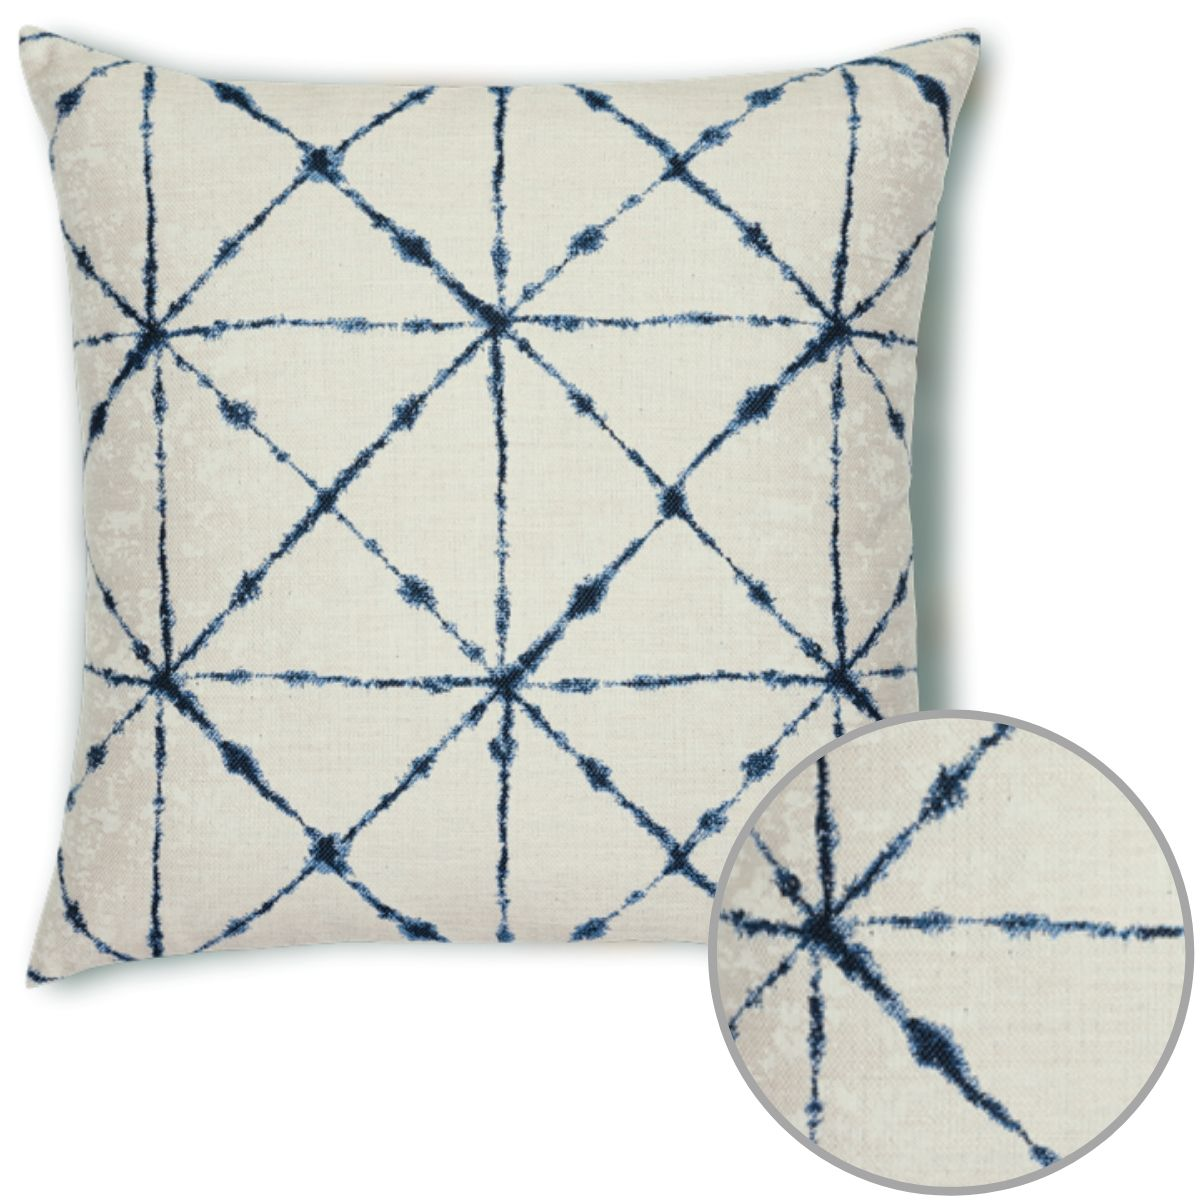 trilogy-indigo-pillow sunbrella by Elaine Smith